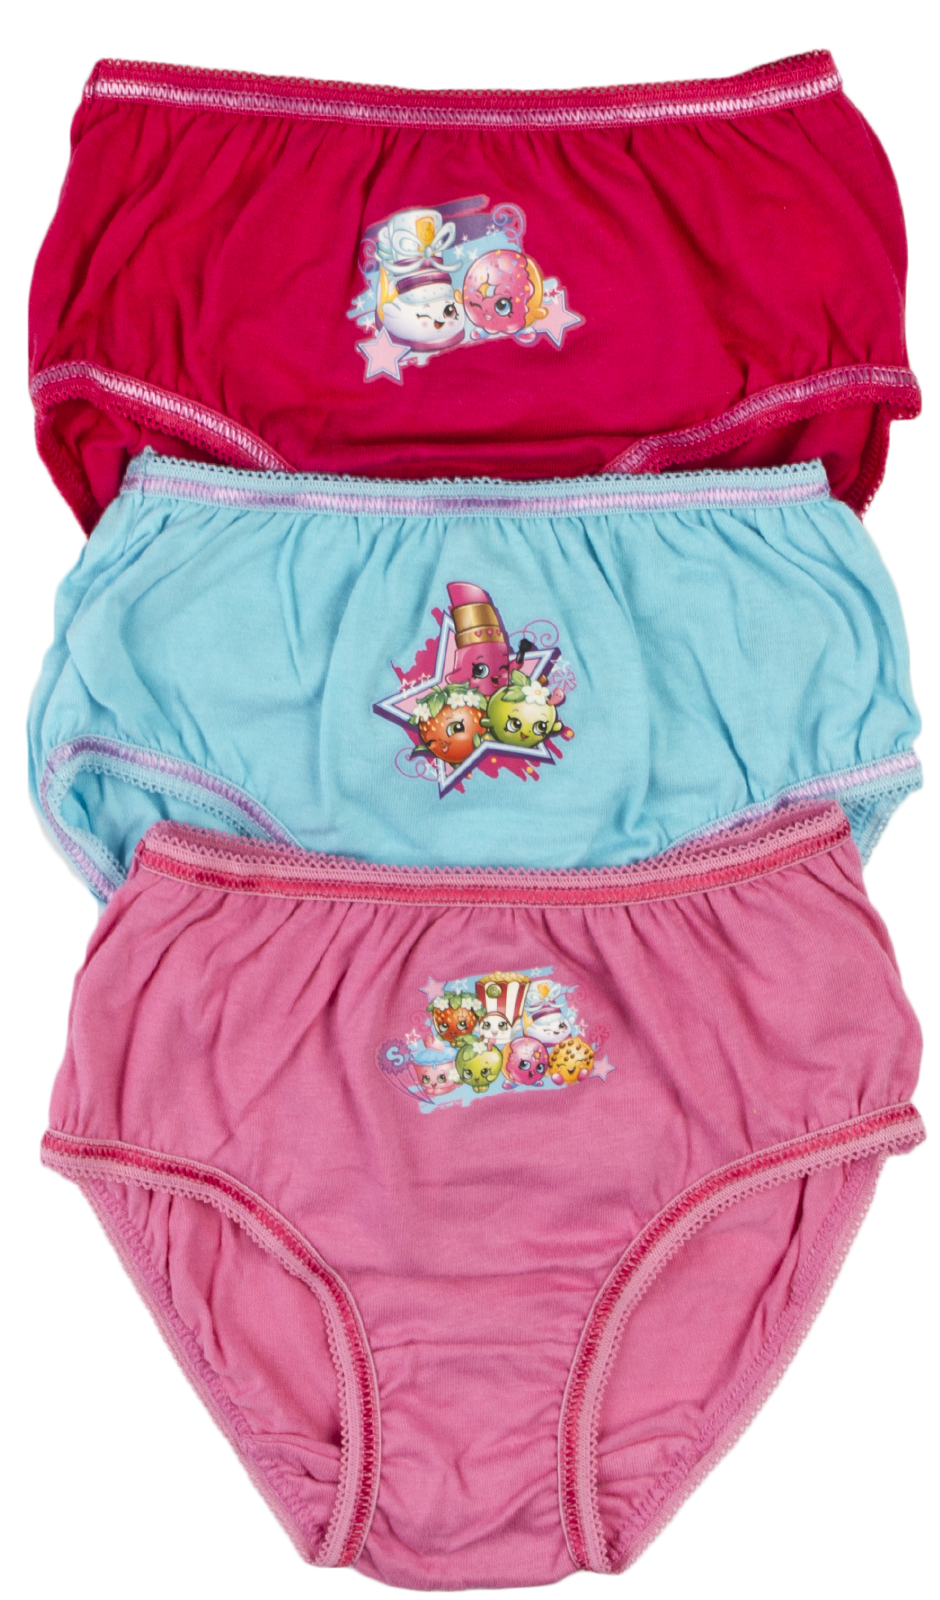 8er Pack Ragazza Slip Mutande Bambini